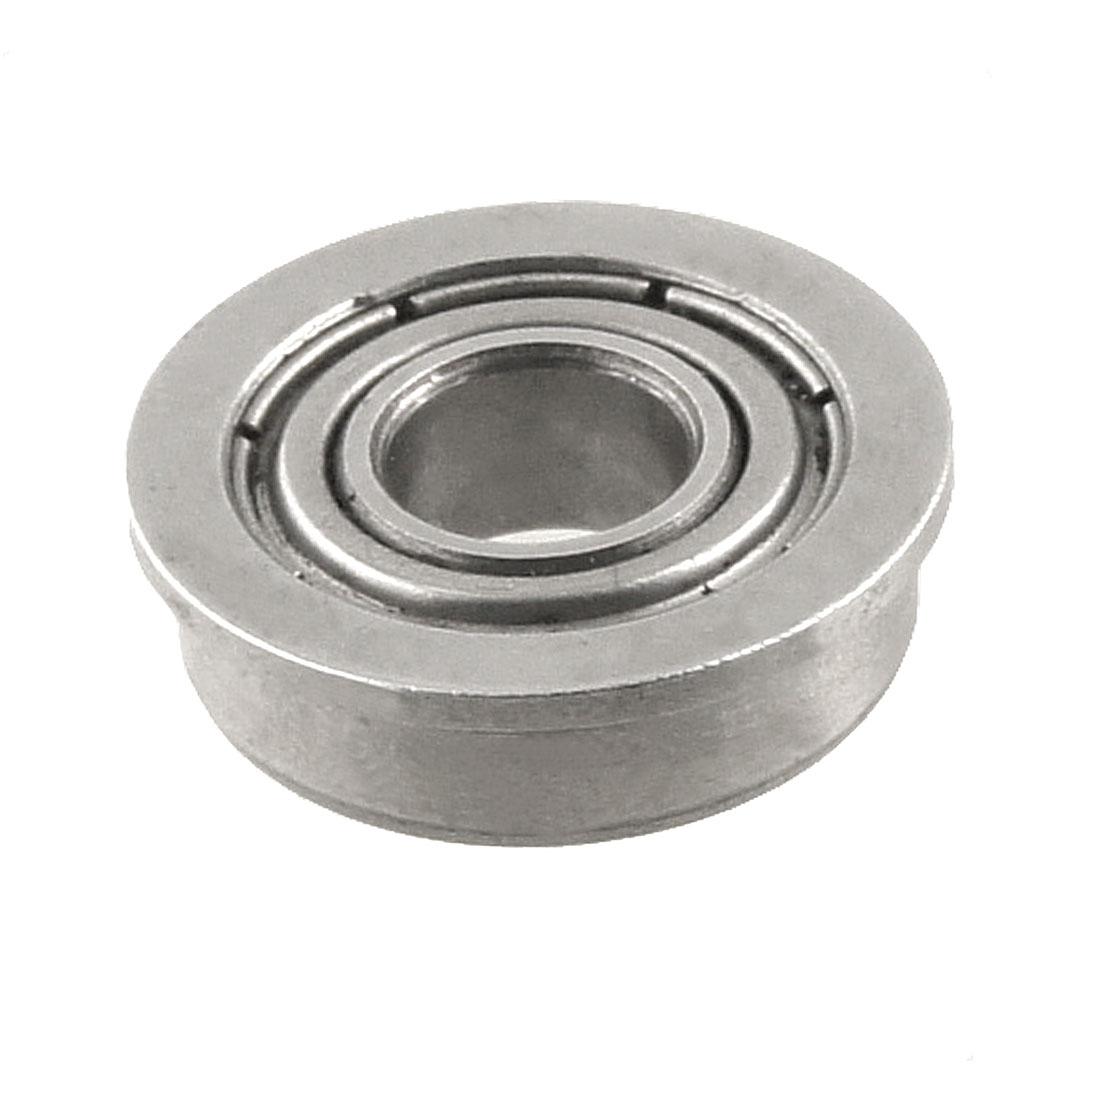 Silver Tone Metal 16mm x 6.5mm x 5mm Shield Ball Bearing